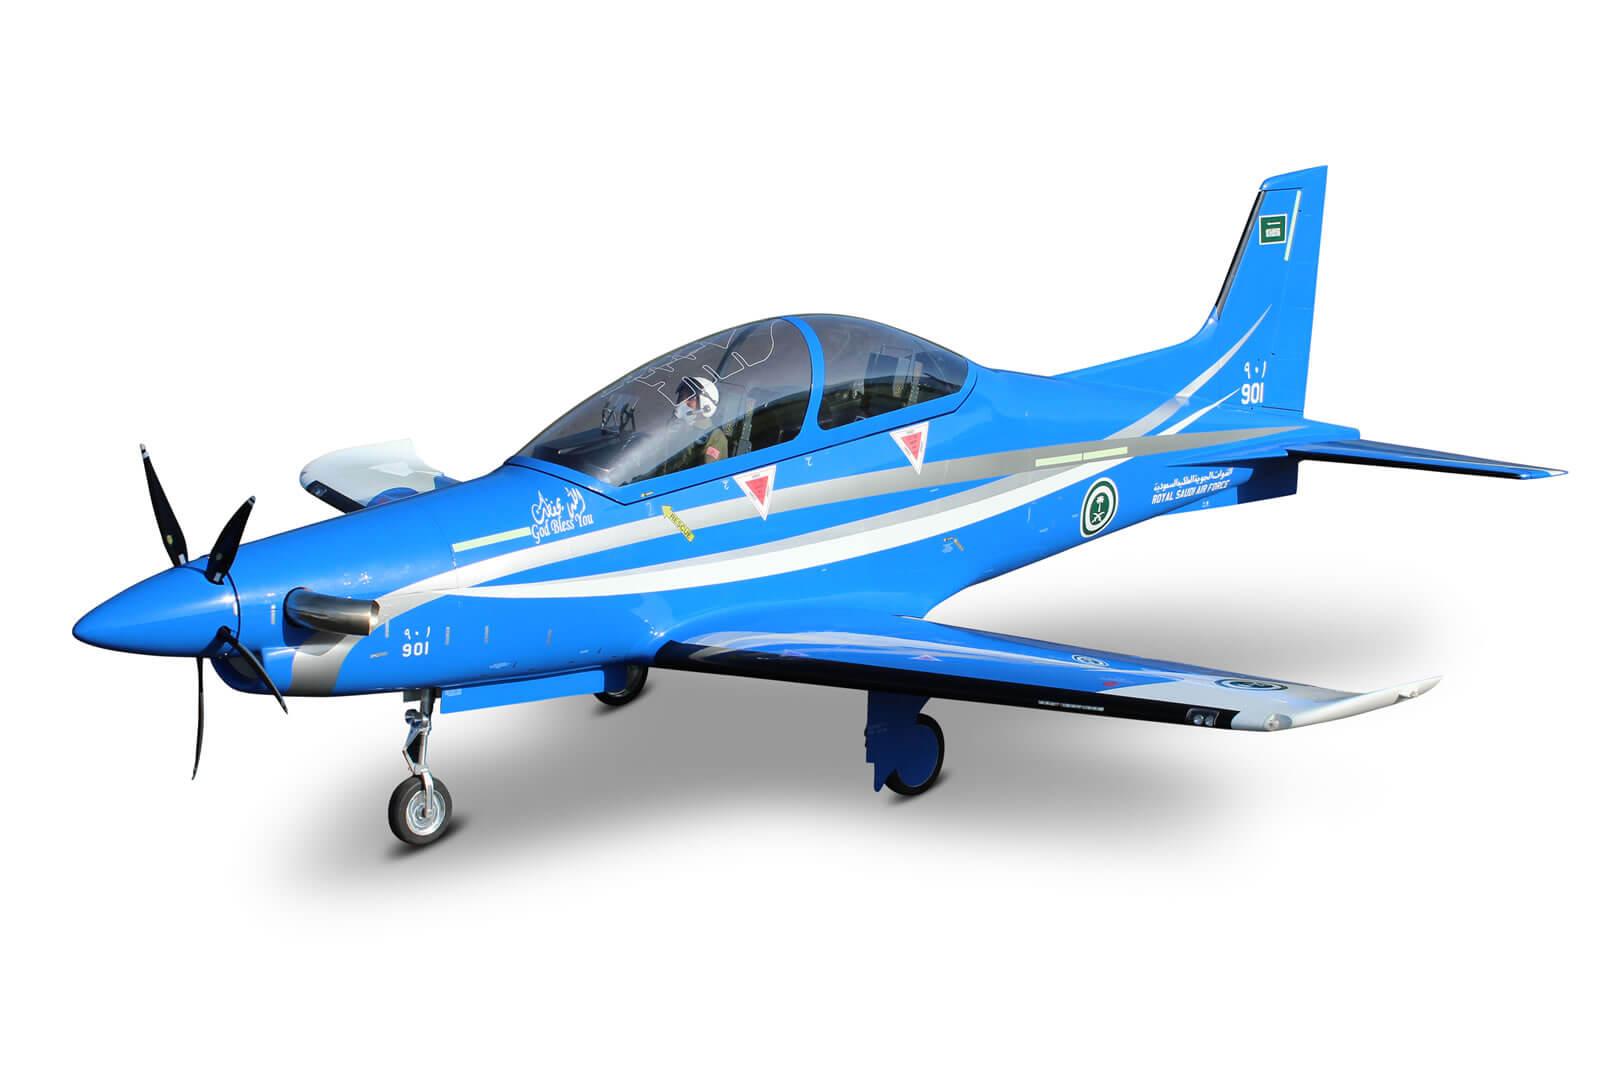 Tomahawk Pilatus PC-21 Turboprop